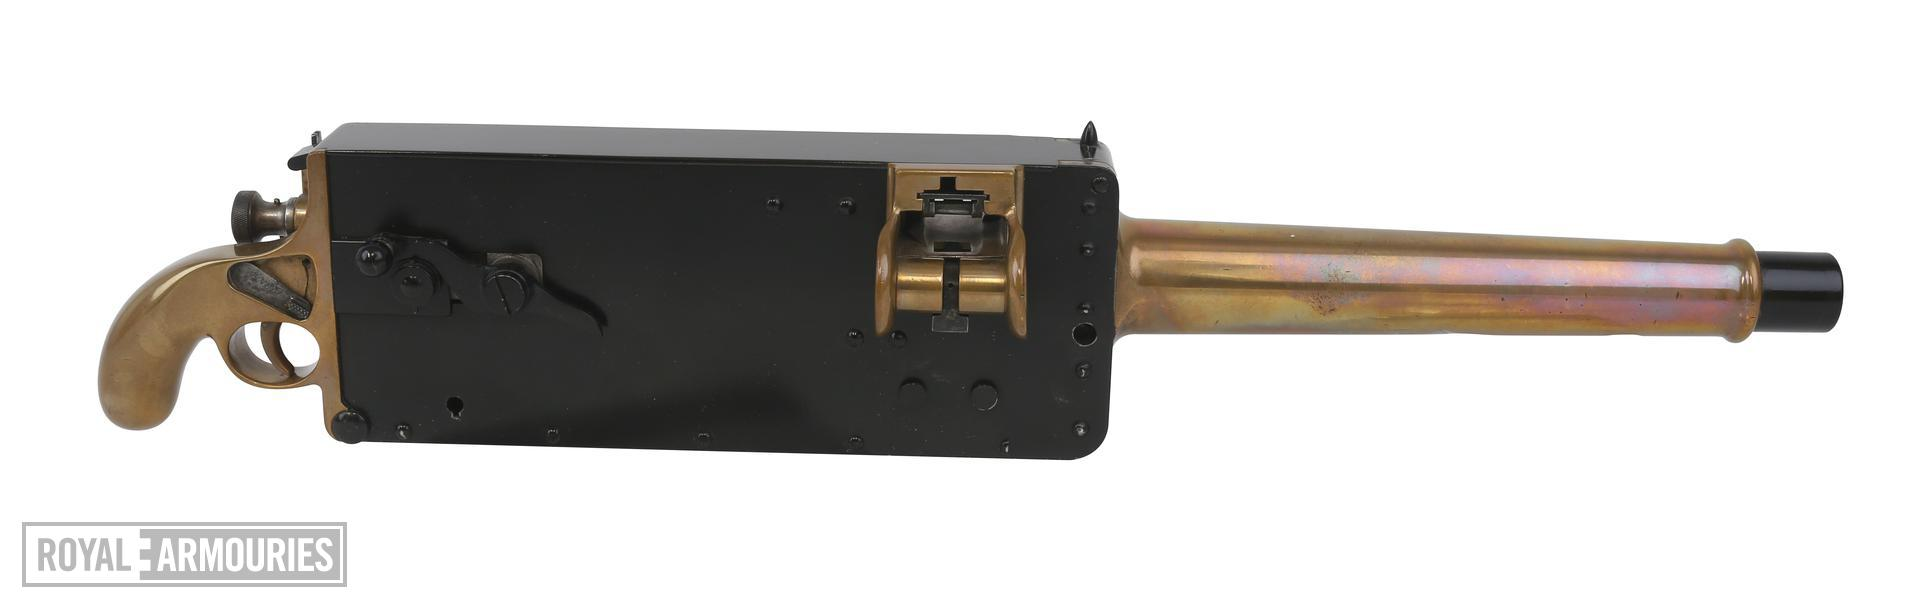 Centrefire automatic machine gun - Miniature Maxim gun